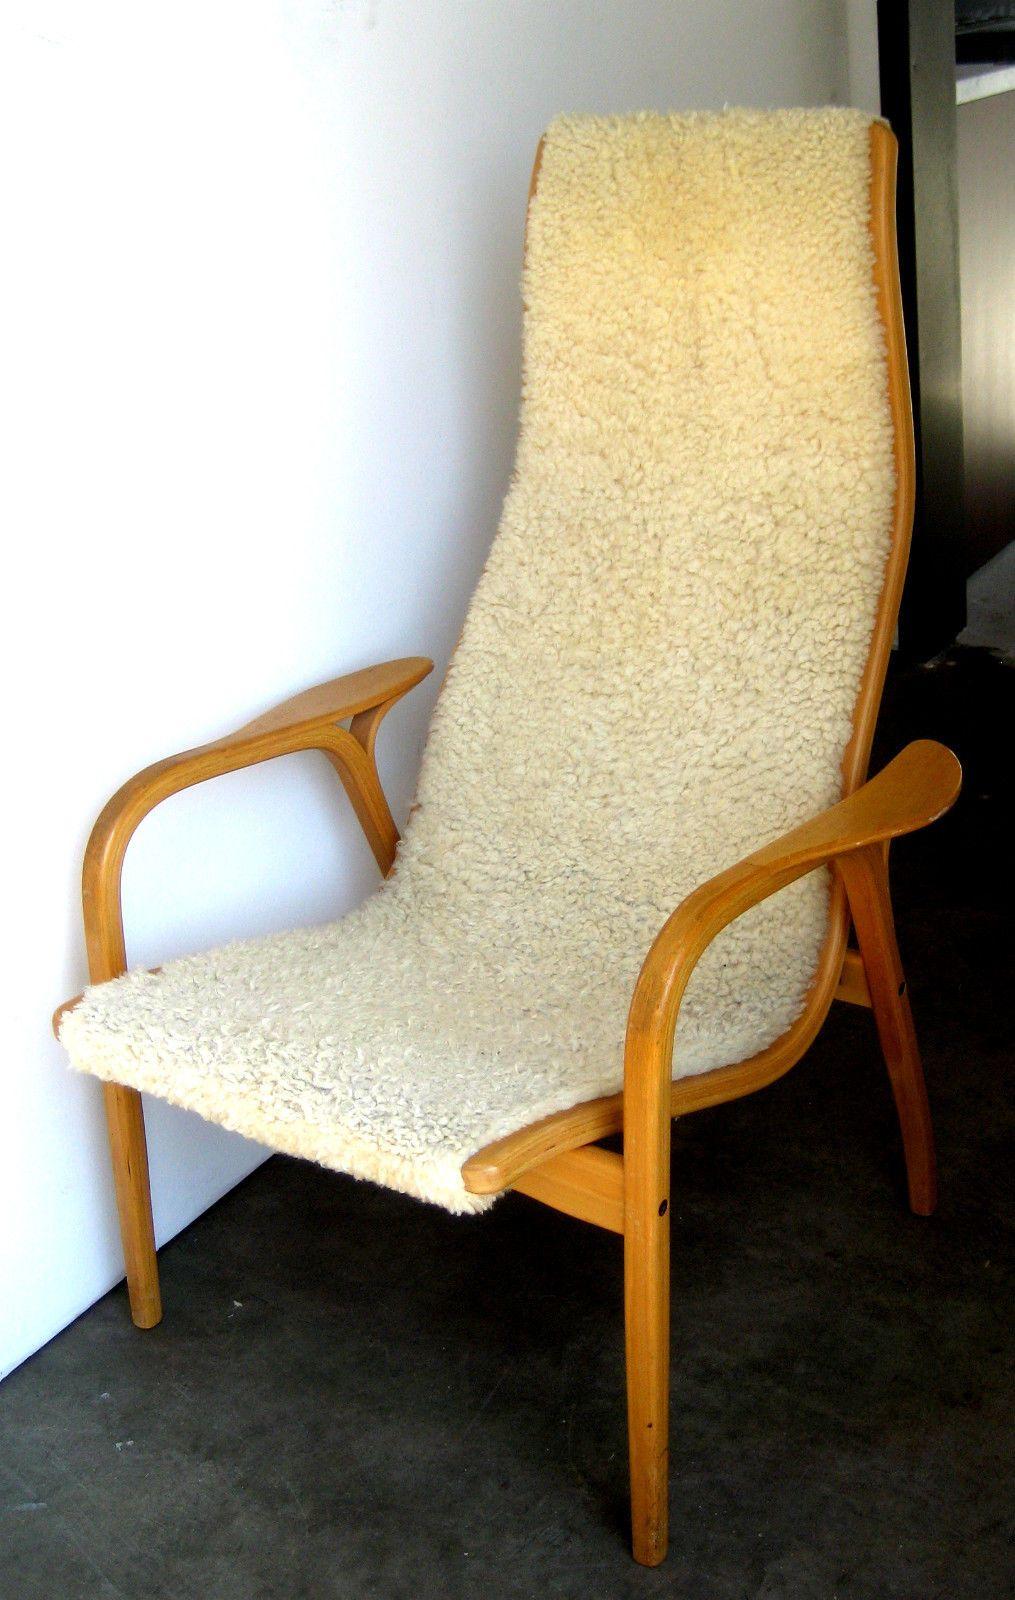 details about danish modern eames wegner era yngve ekstr m lamino rh pinterest com ebay mid century modern furniture uk ebay mid century modern furniture